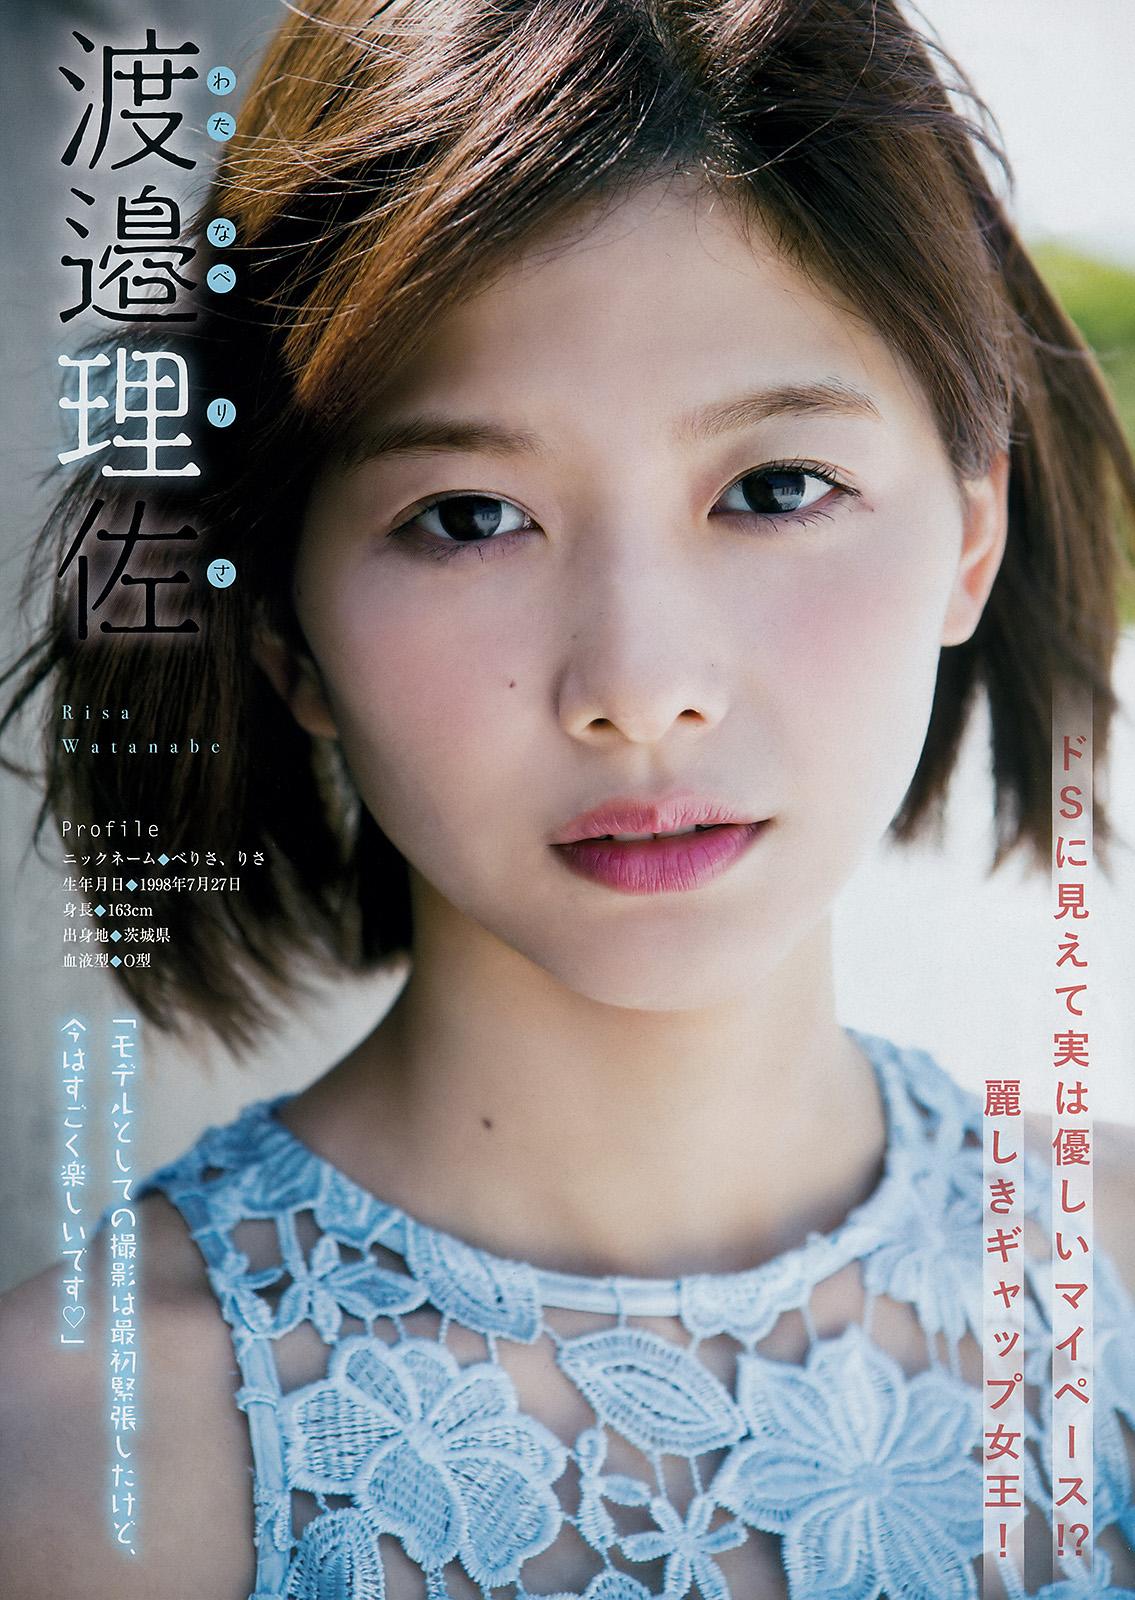 Sugai Yuuka 菅井友香, Watanabe Risa 渡邉理佐 Keyakizaka46, Young Magazine 2017.07.17 No.31 (週刊ヤングマガジン 2017年31号)